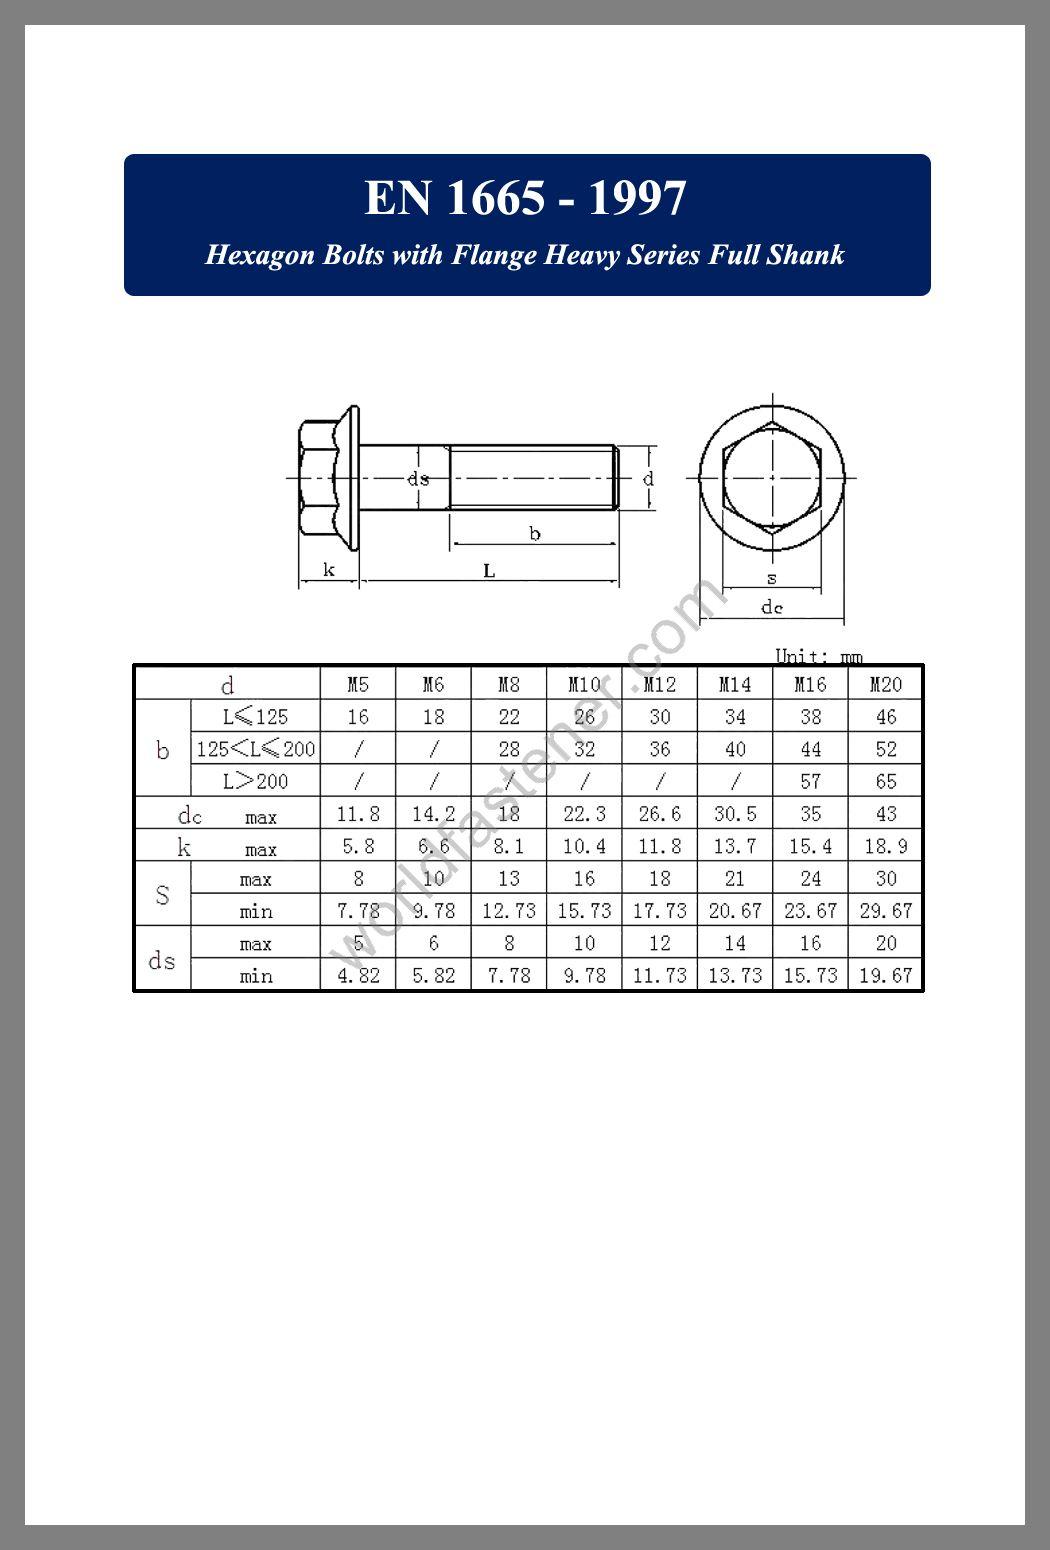 EN 1665, EN 1665 Hexagon Bolts with Flange Heavy Series Full Shank, Flanged Bolts, Flange screws, fastener, screw, bolt, EN bolts